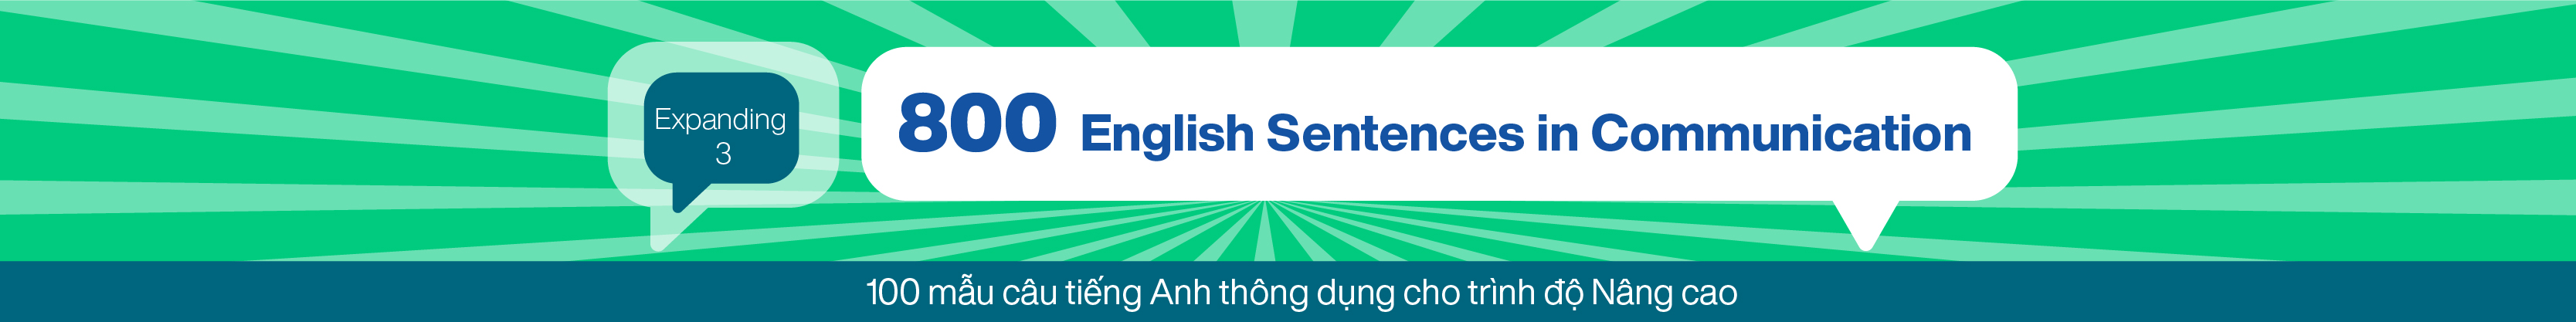 800 English Sentences in Communication (Expanding 3) banner